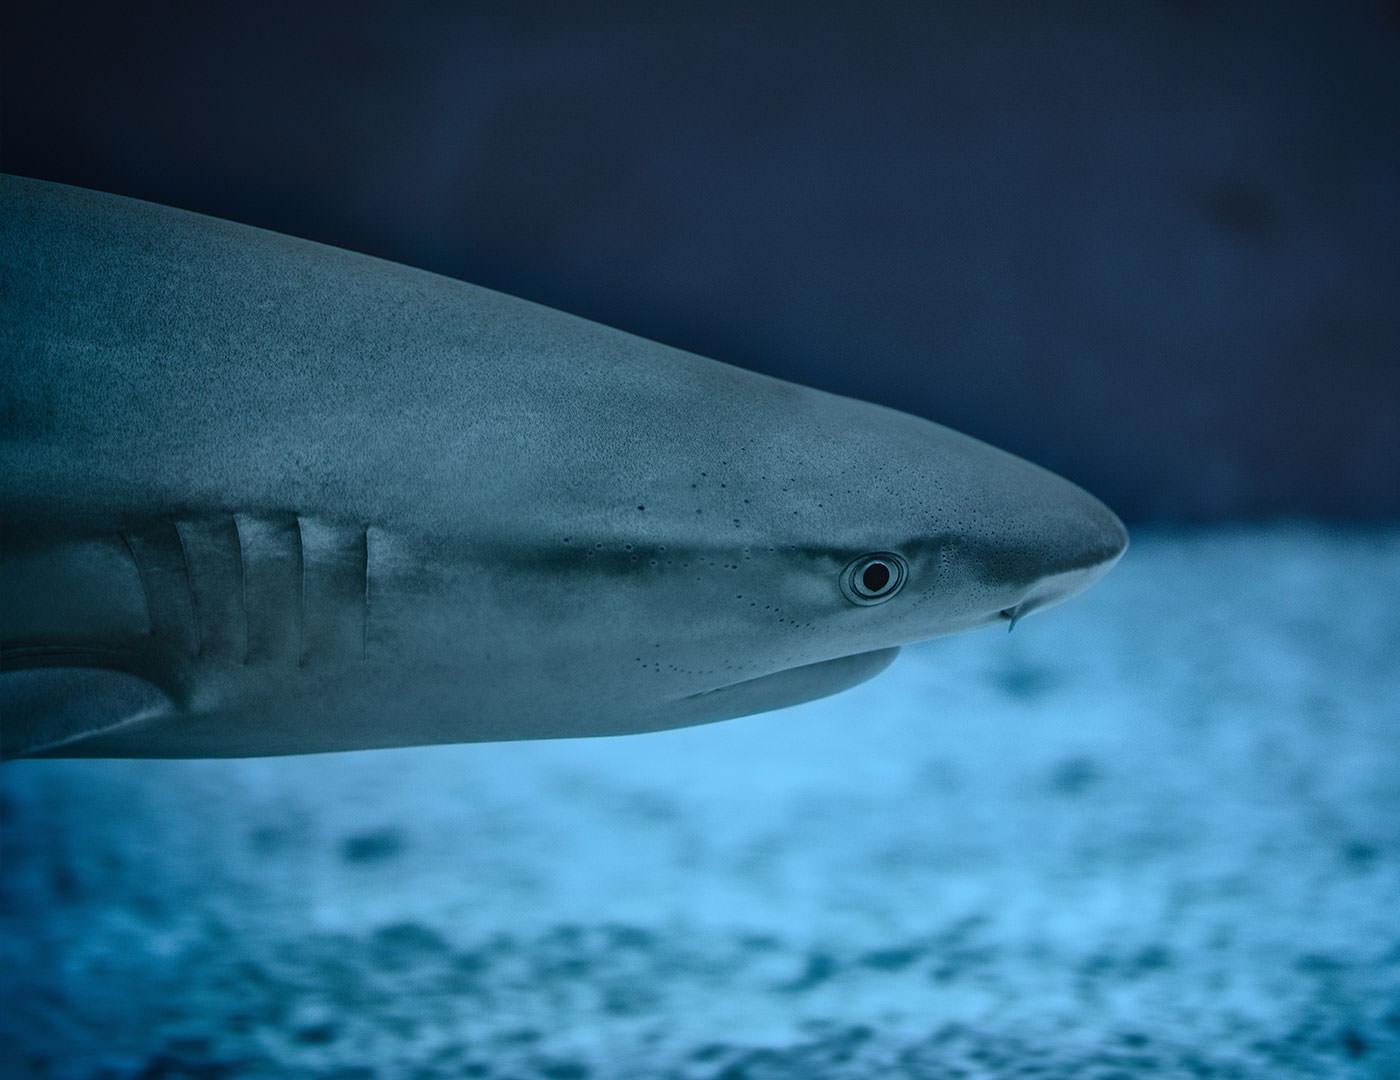 Shark - the dark side